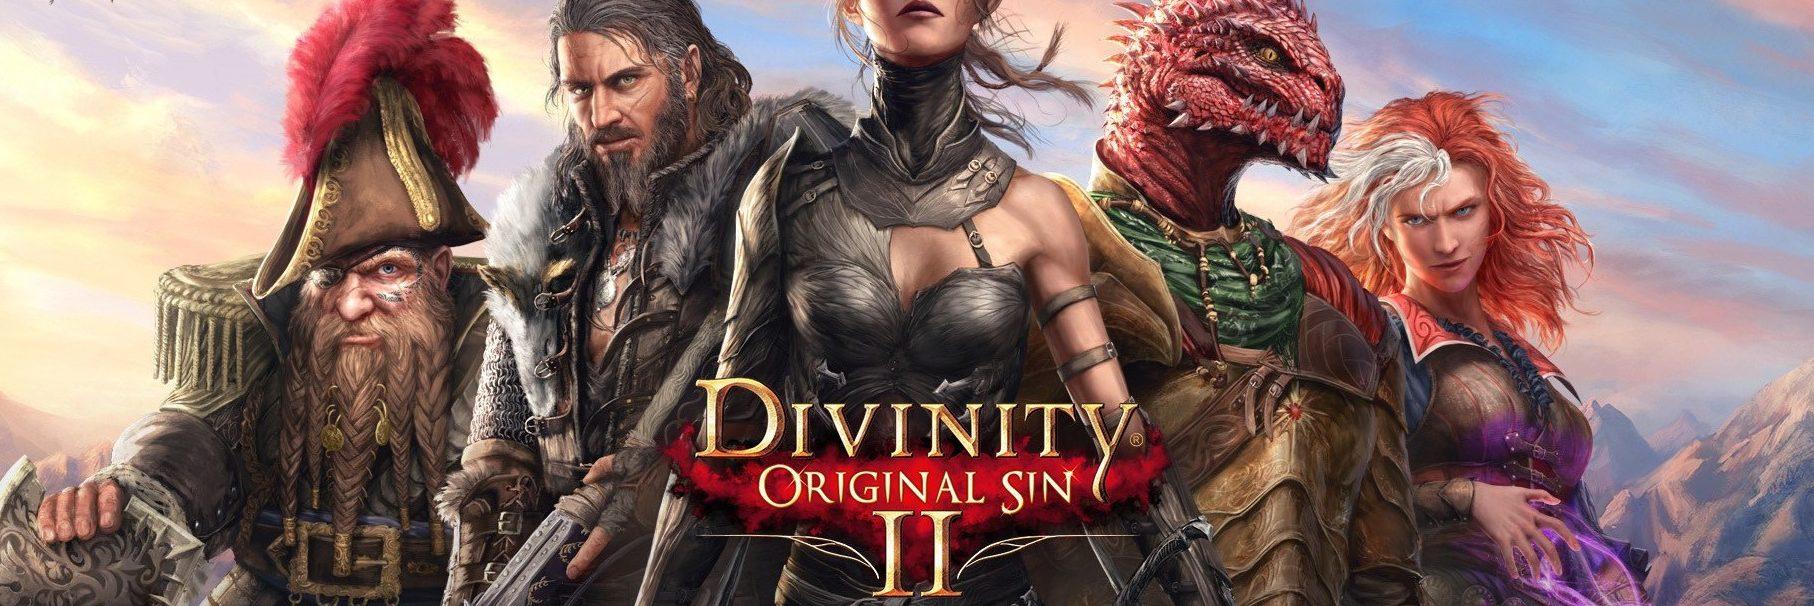 Divinity: Original Sin II – In Extenso